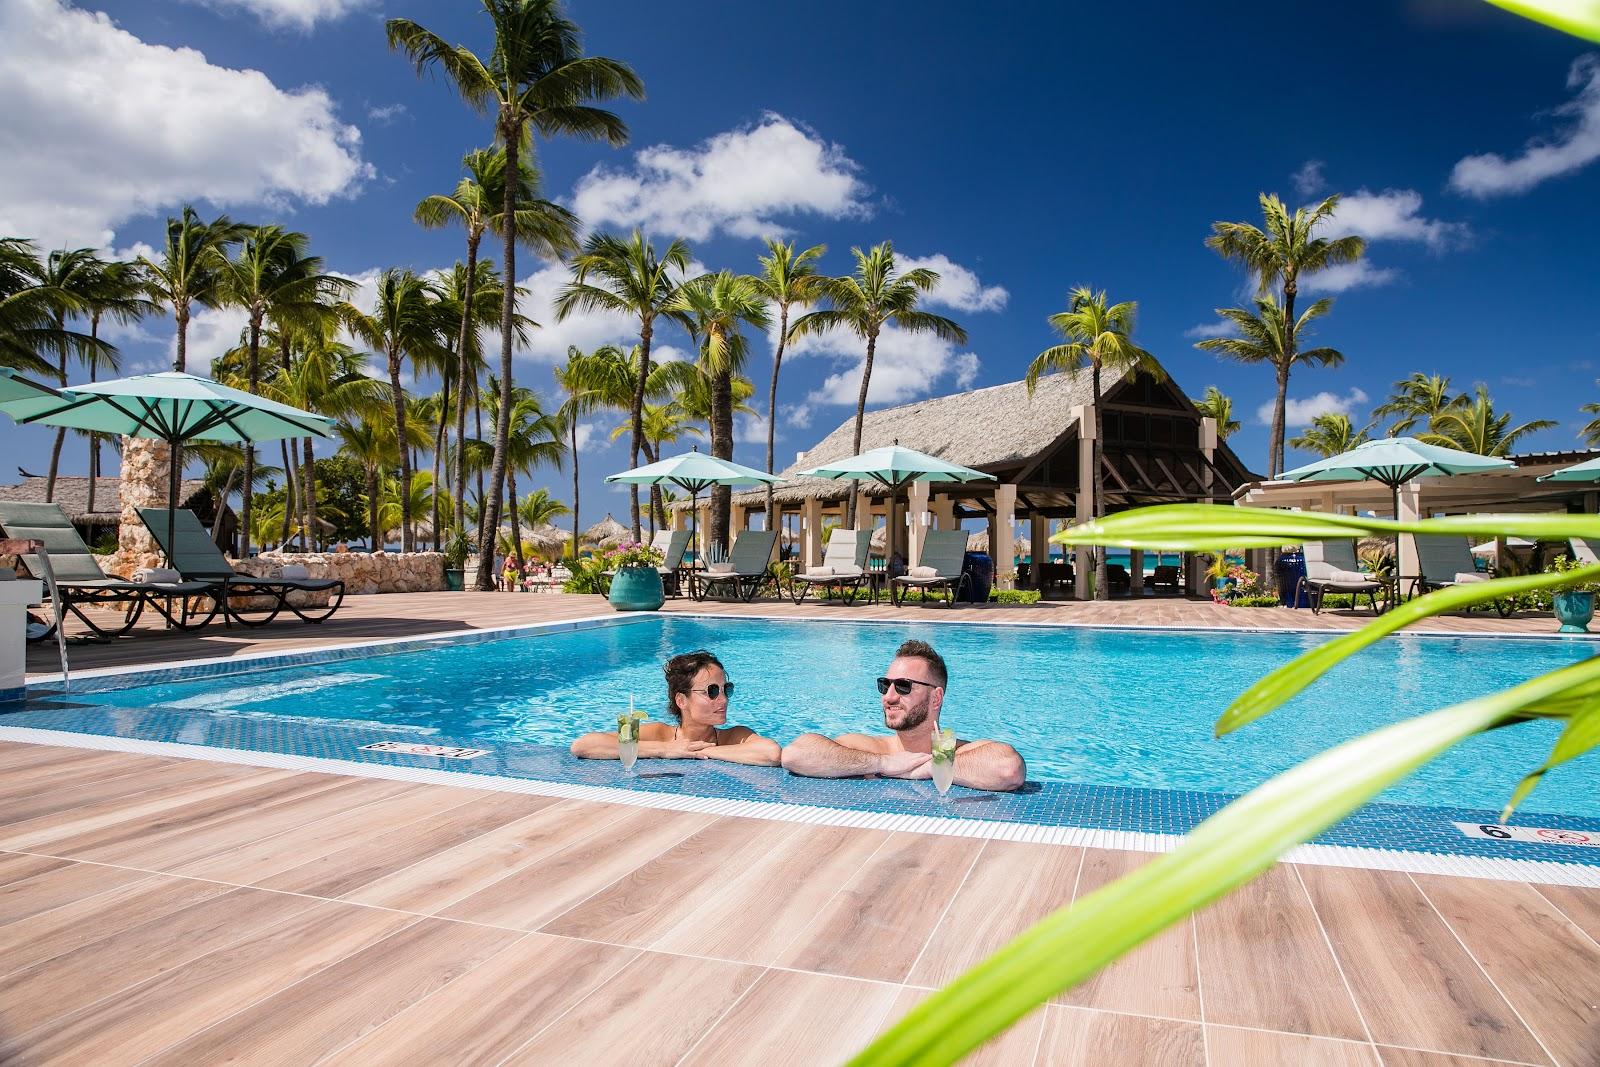 Aruba resort & spa